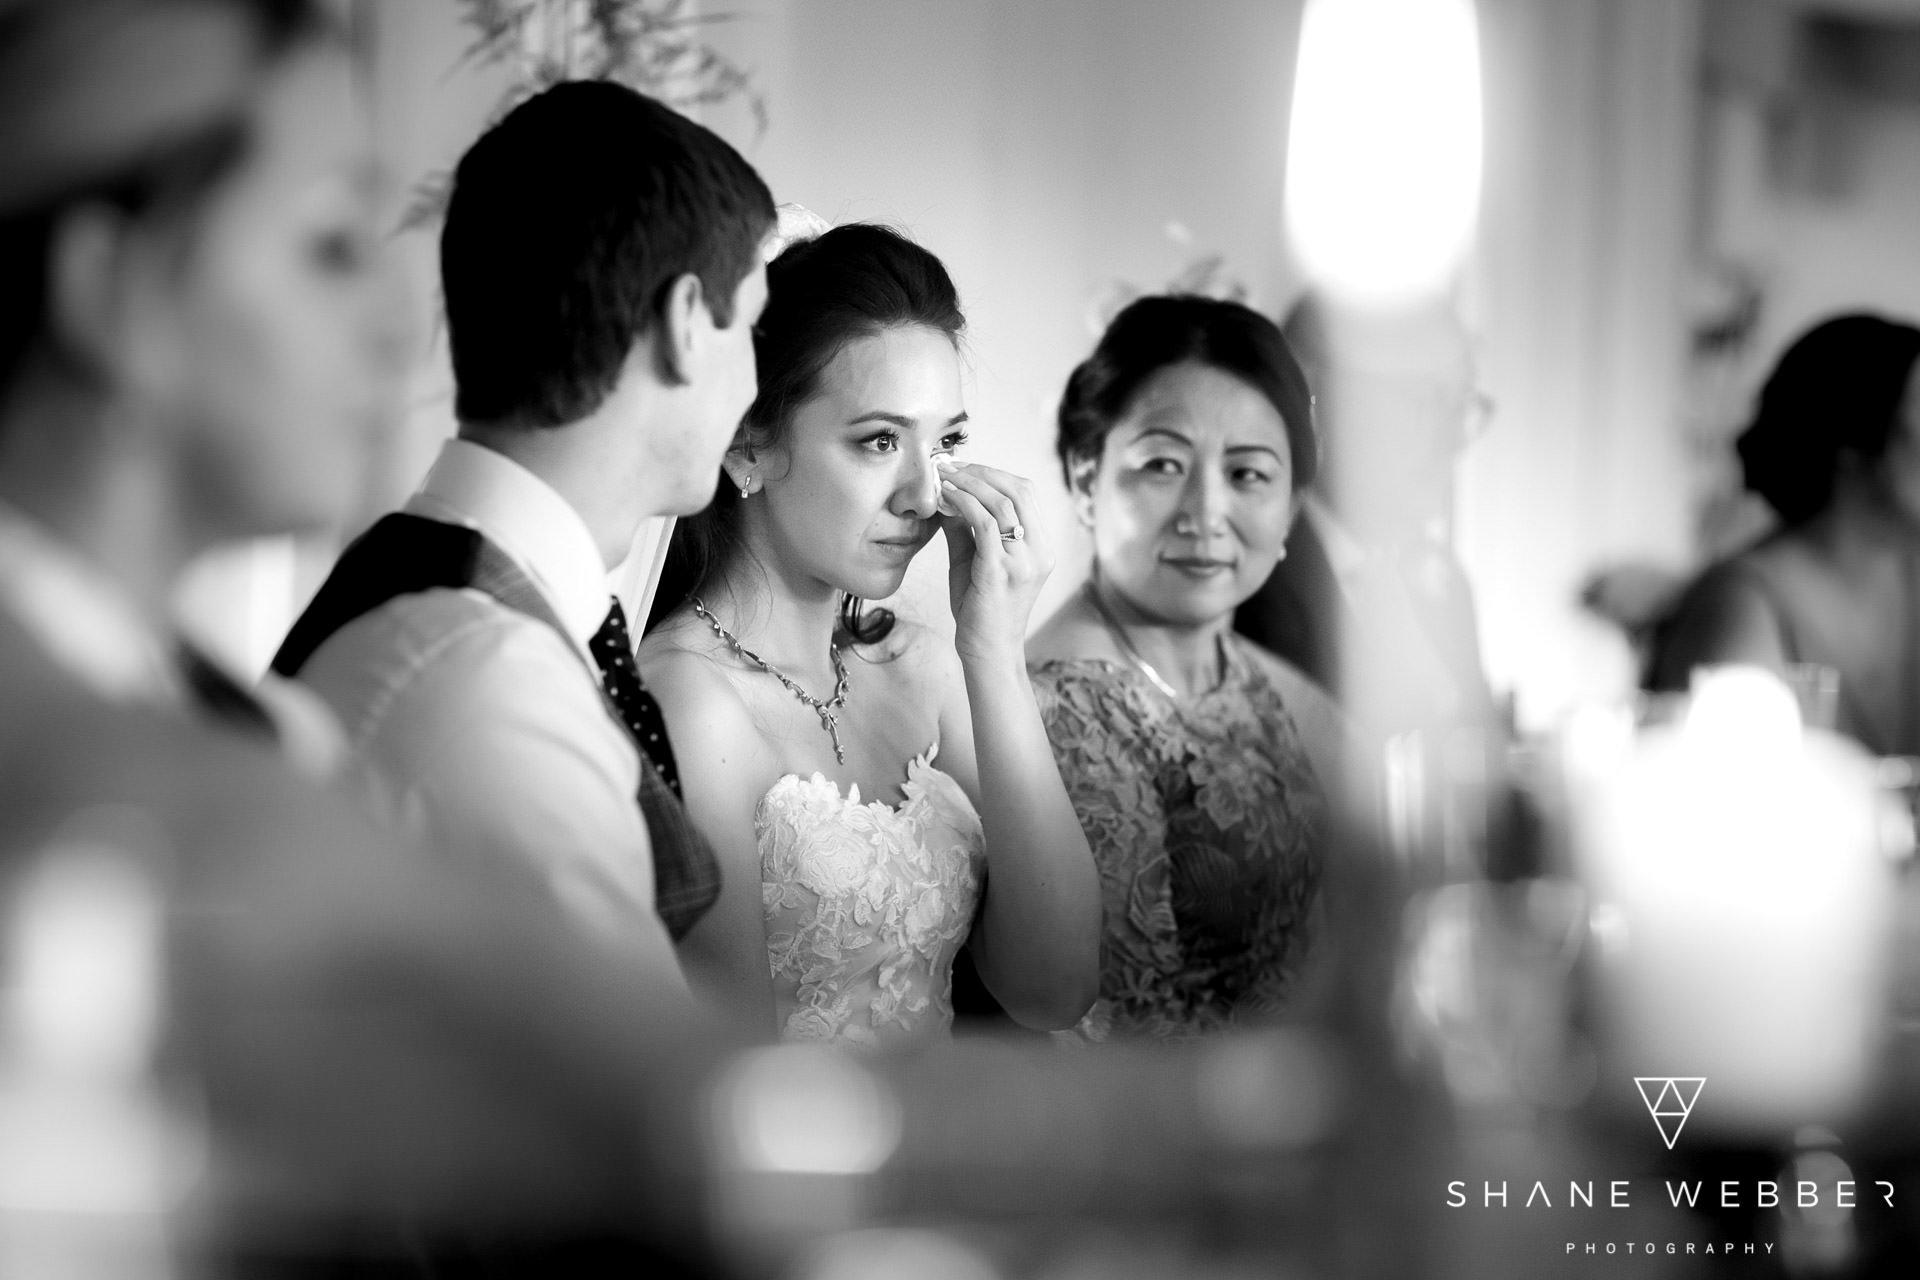 Wedding day black and white photo